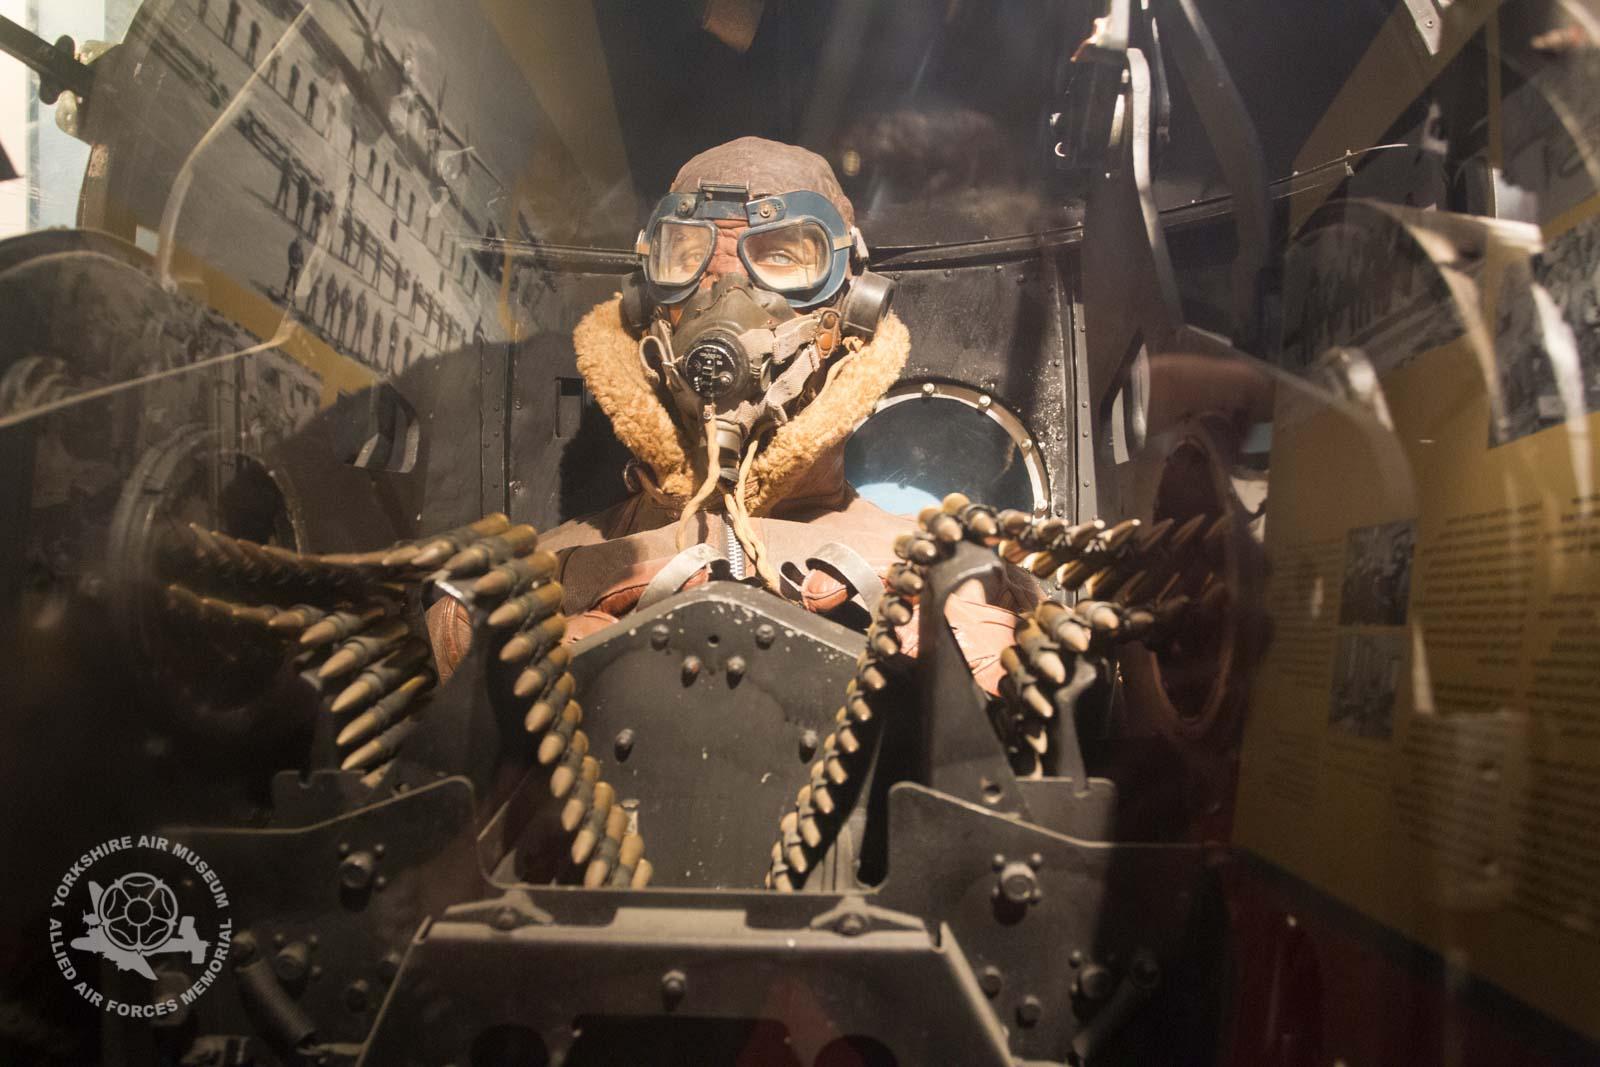 Crowdfunding To Help Get A 90 Year Old Ww2 Raf Air Gunner